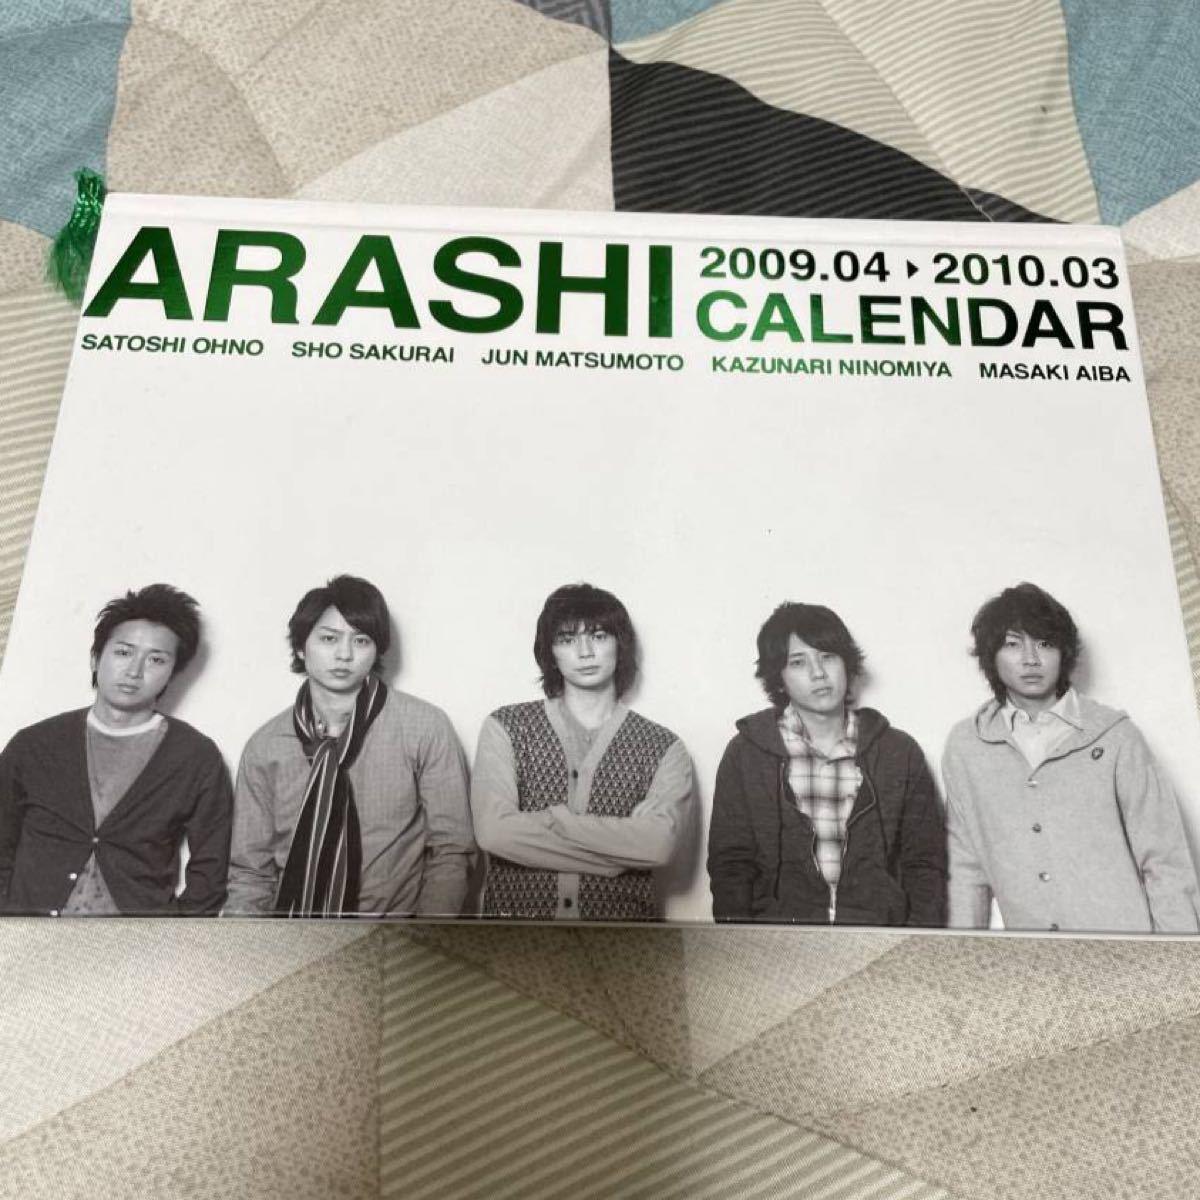 嵐 2009  2010 カレンダー ARASHI 相葉雅紀 松本潤 大野智 二宮和也 櫻井翔